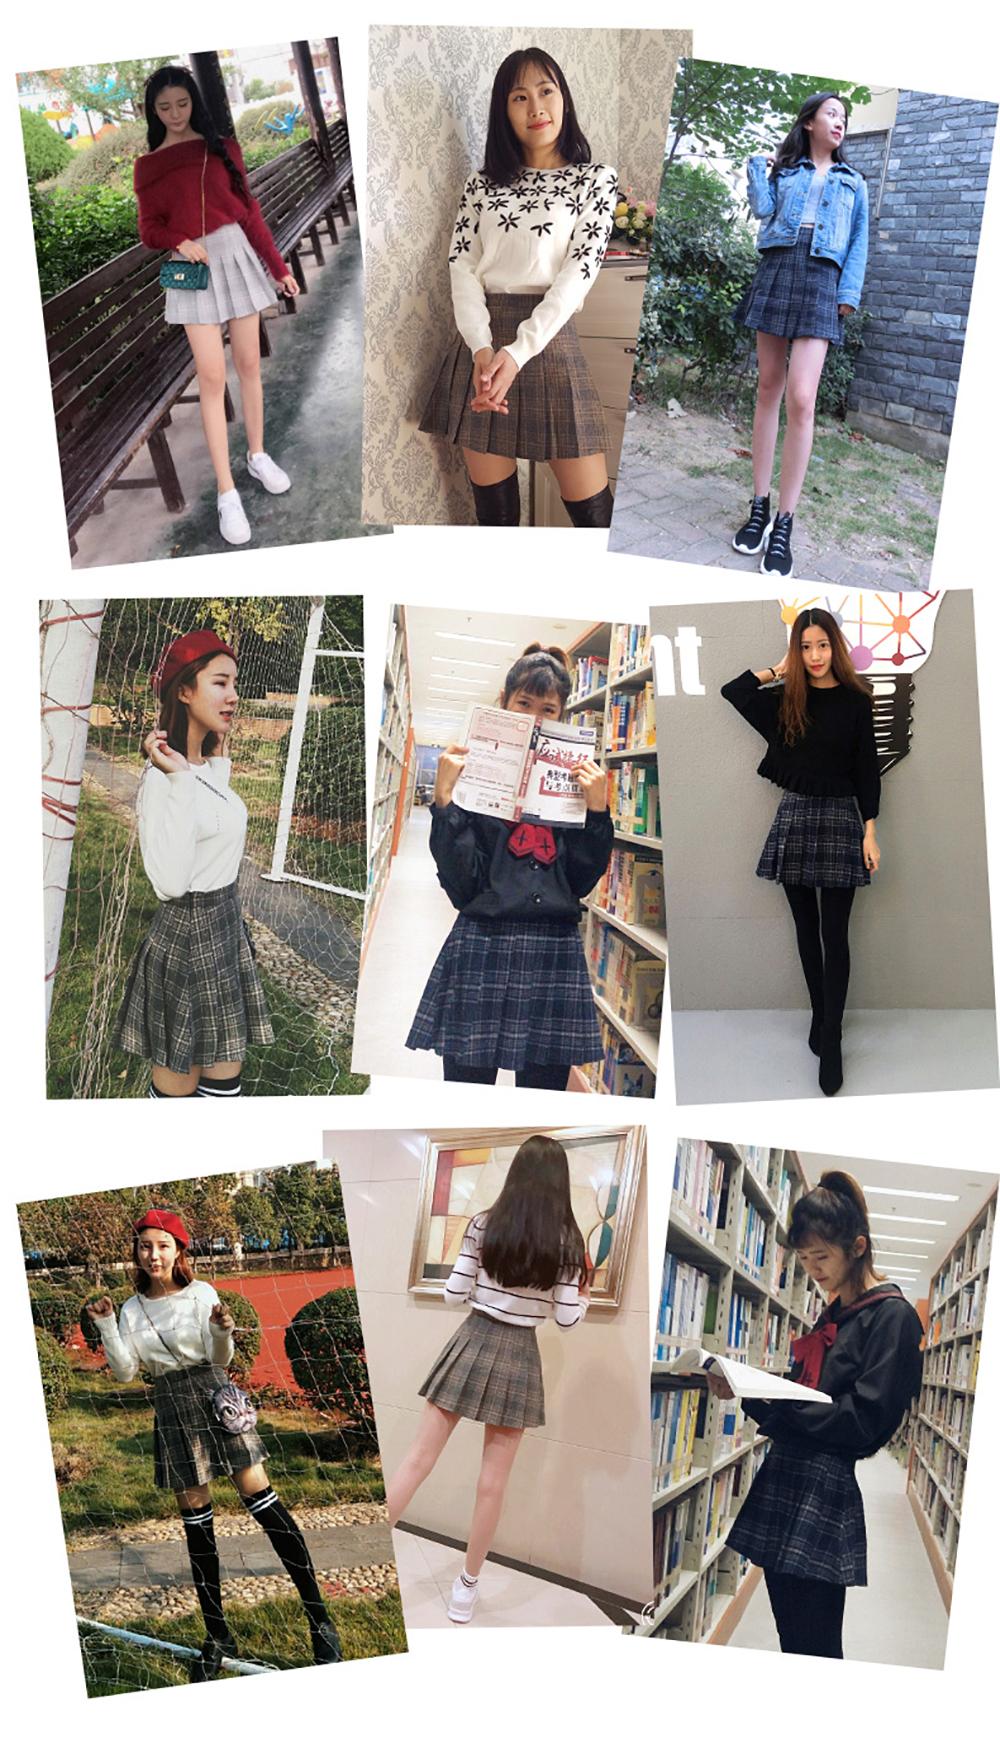 Plus Size Harajuku Short Skirt New Korean Plaid Skirt Women Zipper High Waist School Girl Pleated Plaid Skirt Sexy Mini Skirt 4